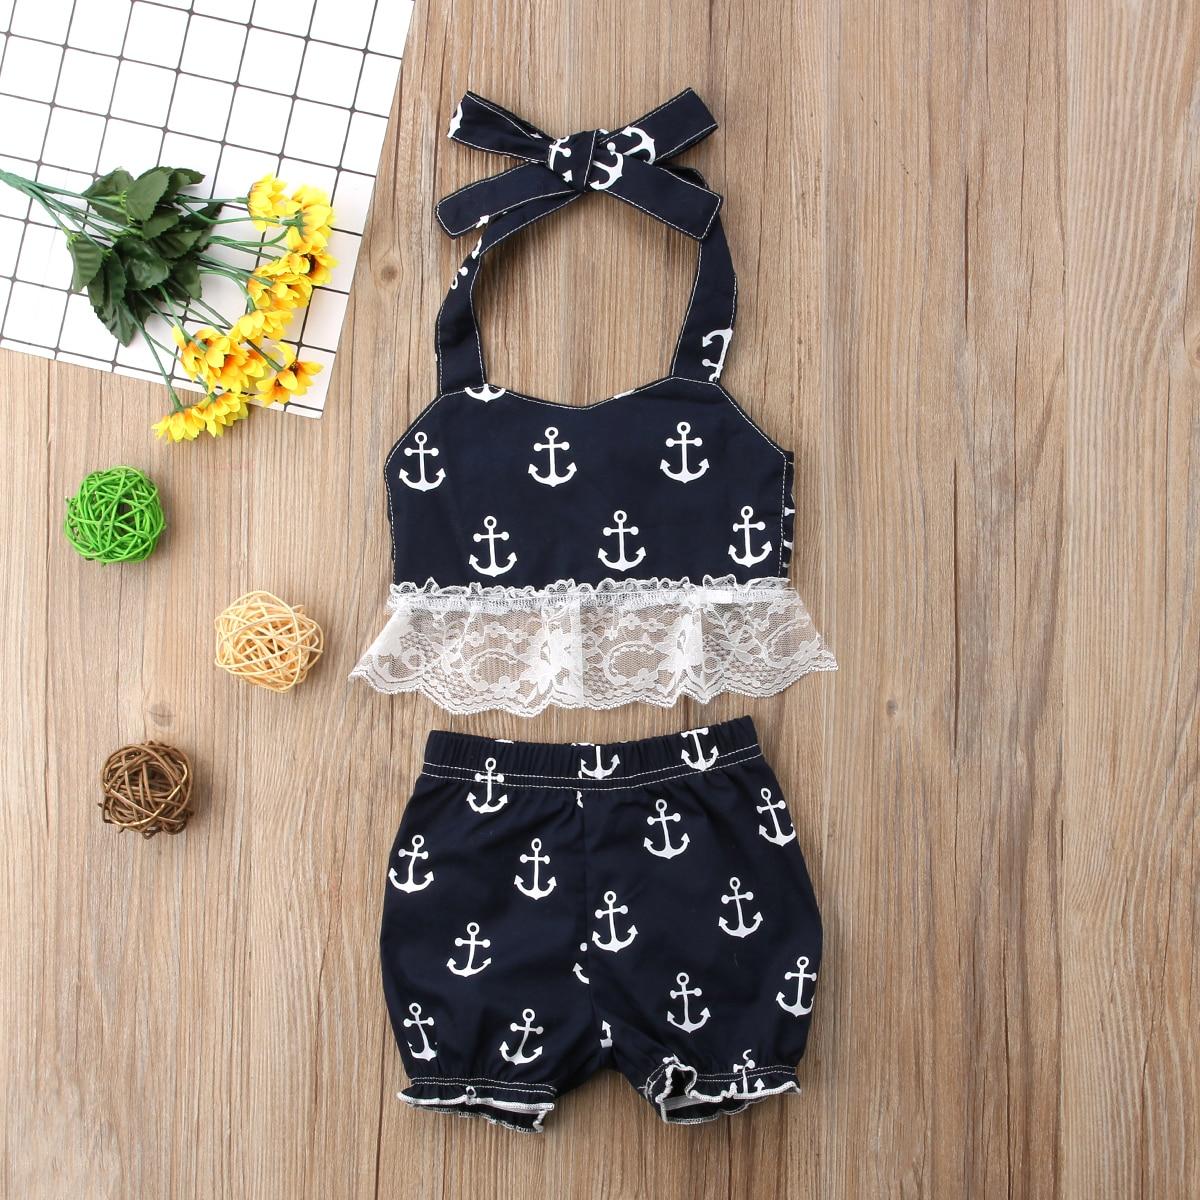 Betrouwbare Schattige Peuter Baby Meisjes Anker Kant Sling Top Vest Shorts Zomer Print Outfits Set Kleding Set Zwarte Kleding Set Yu